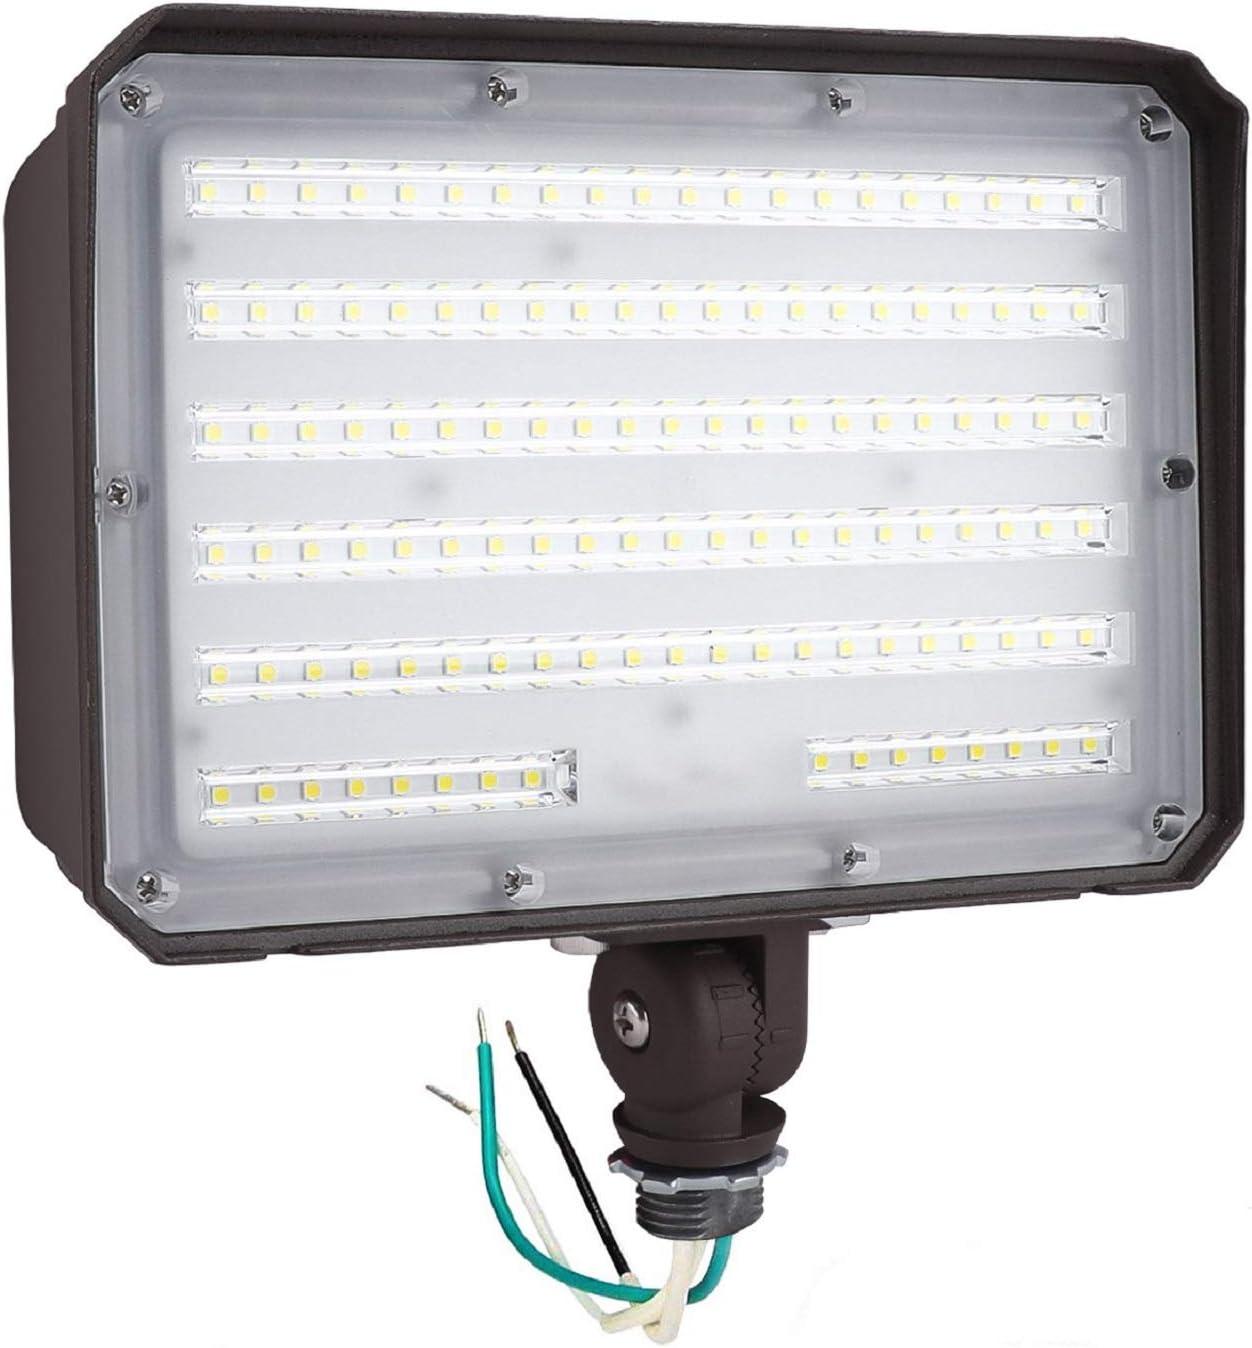 CINOTON 100W LED Flood Light Outdoor, IP65 Waterproof Rating Led Flood Light with Knuckle Mount 13000 Lumen (1000W Incandescent Equivalent) 5000K Daylight LED Flood Light for Yard Garden Garage